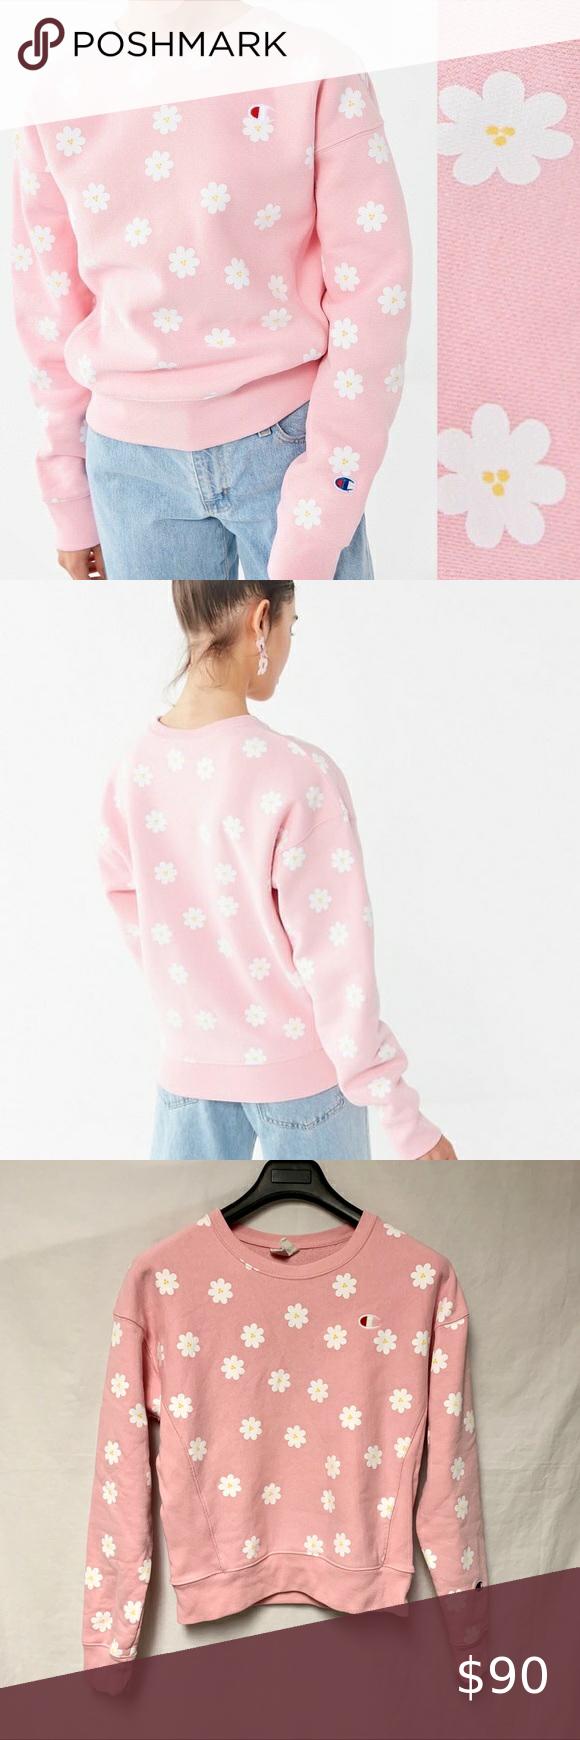 Rare Champion X Urban Outfitters Daisy Sweatshirt In 2021 Sherpa Lined Denim Jacket Daisy Sweatshirt Grey Cropped Hoodie [ 1740 x 580 Pixel ]